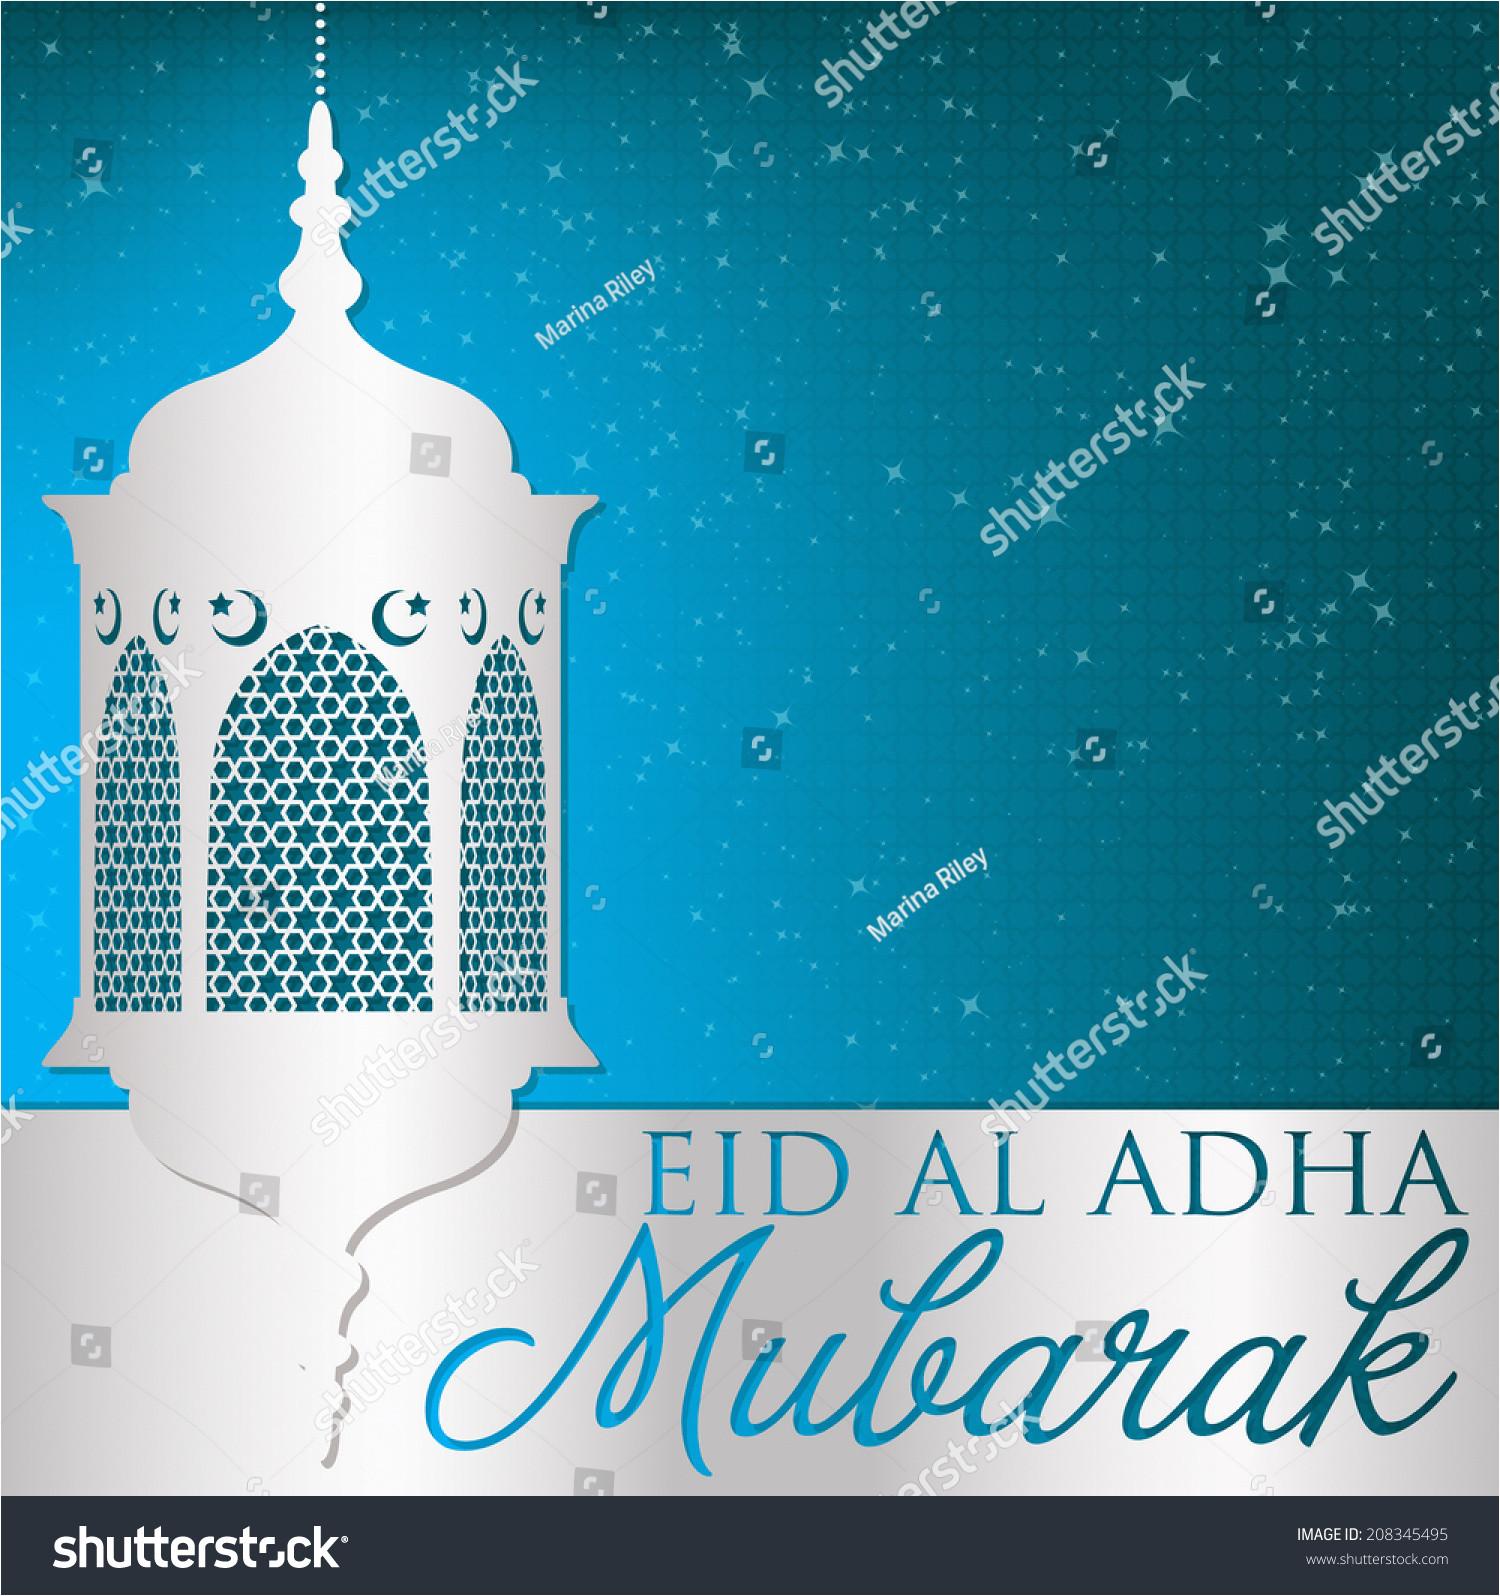 stock vector eid al adha lantern card in vector format 208345495 jpg